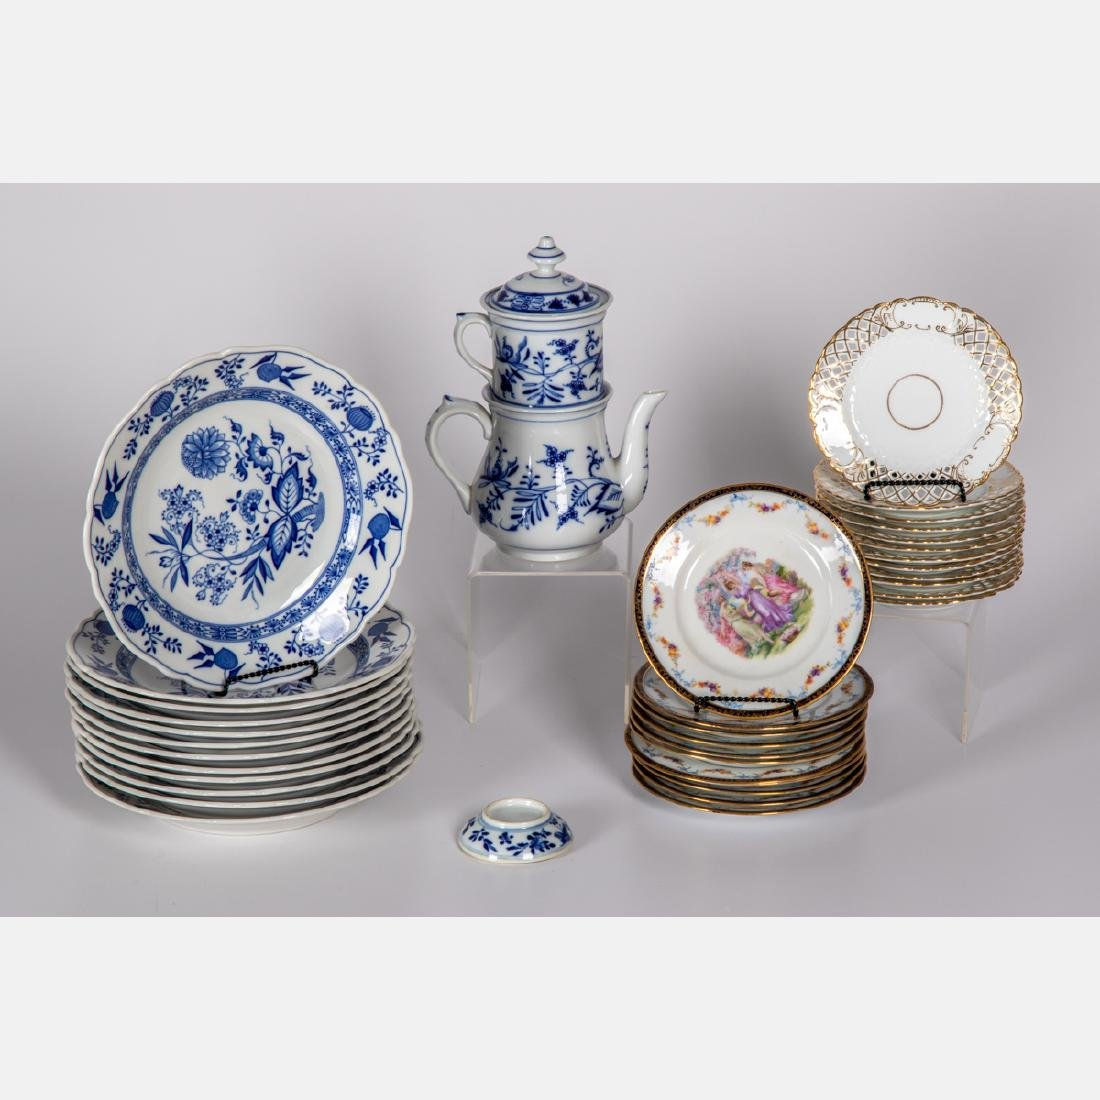 A Miscellaneous Collection of European Porcelain Plates